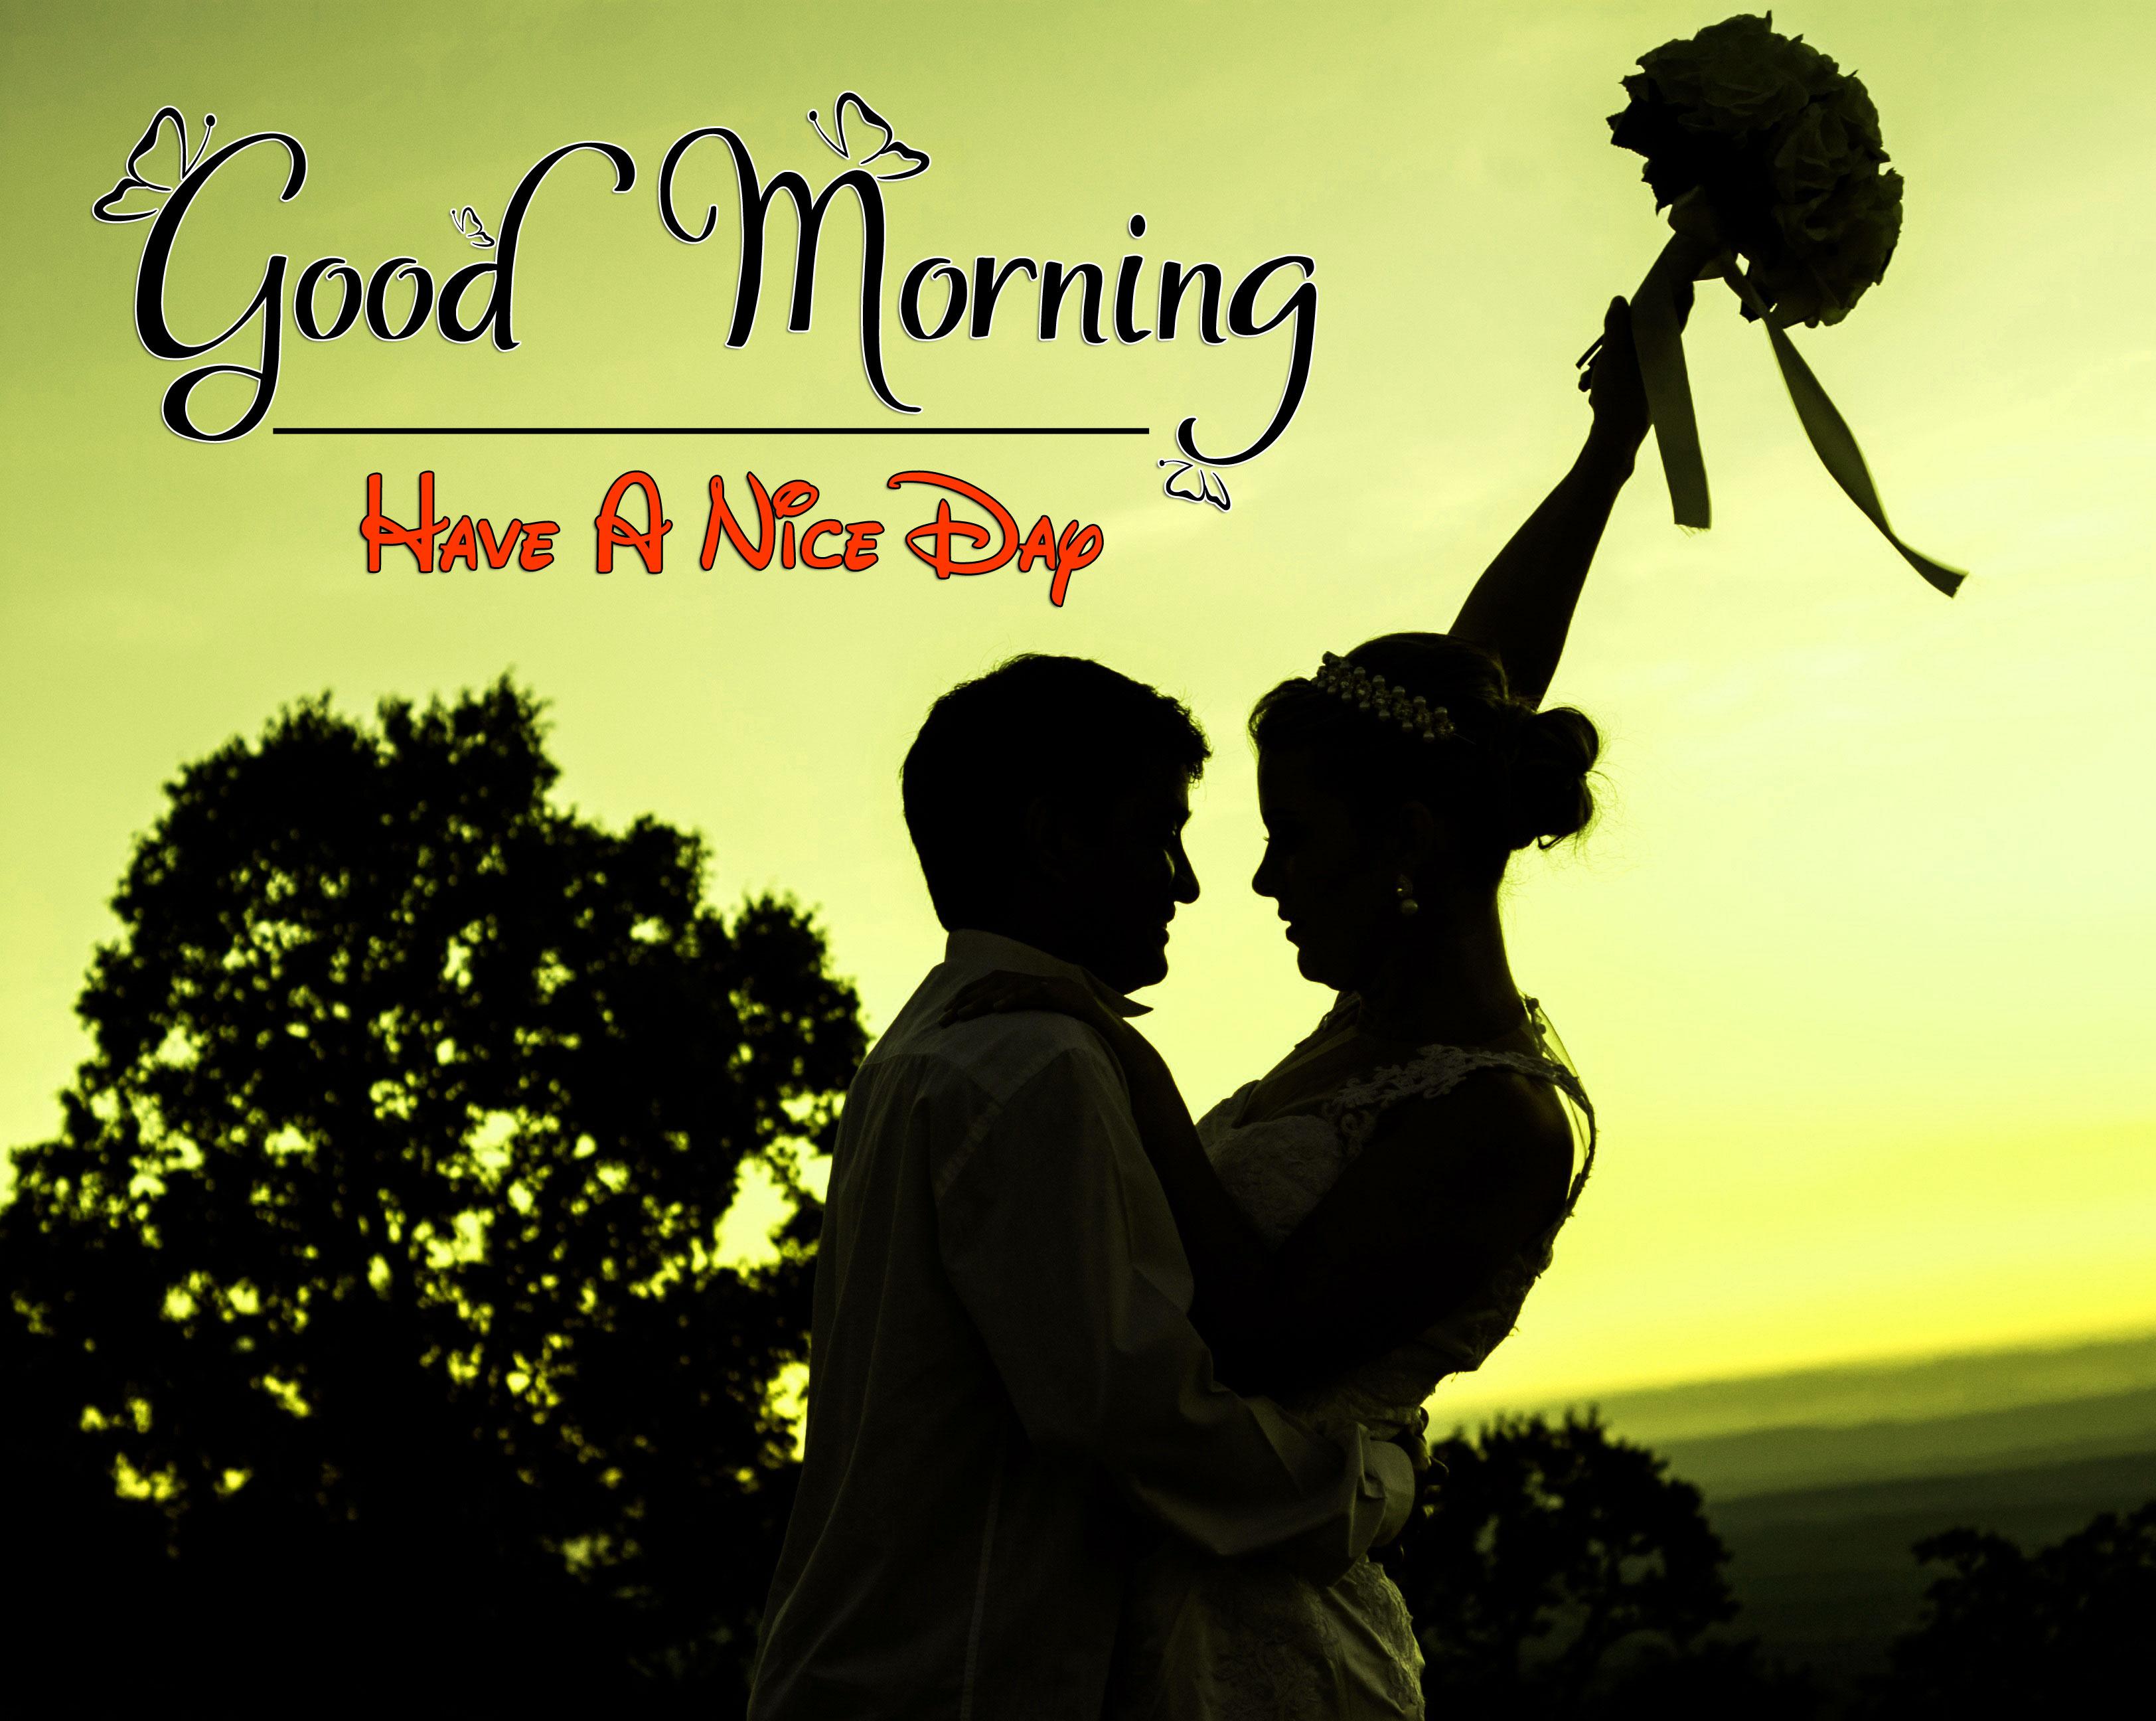 Romantic Good Morning Wallpaper For Whatsapp